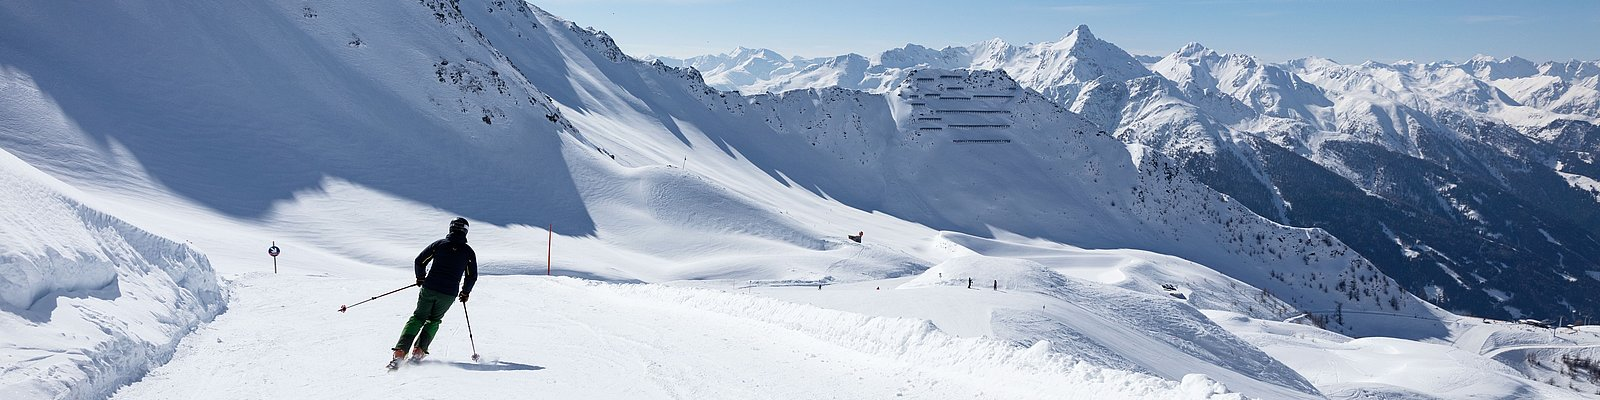 Winter in Matrei (Osttirol) ©Hörterer Lisa (Tirol Werbung)